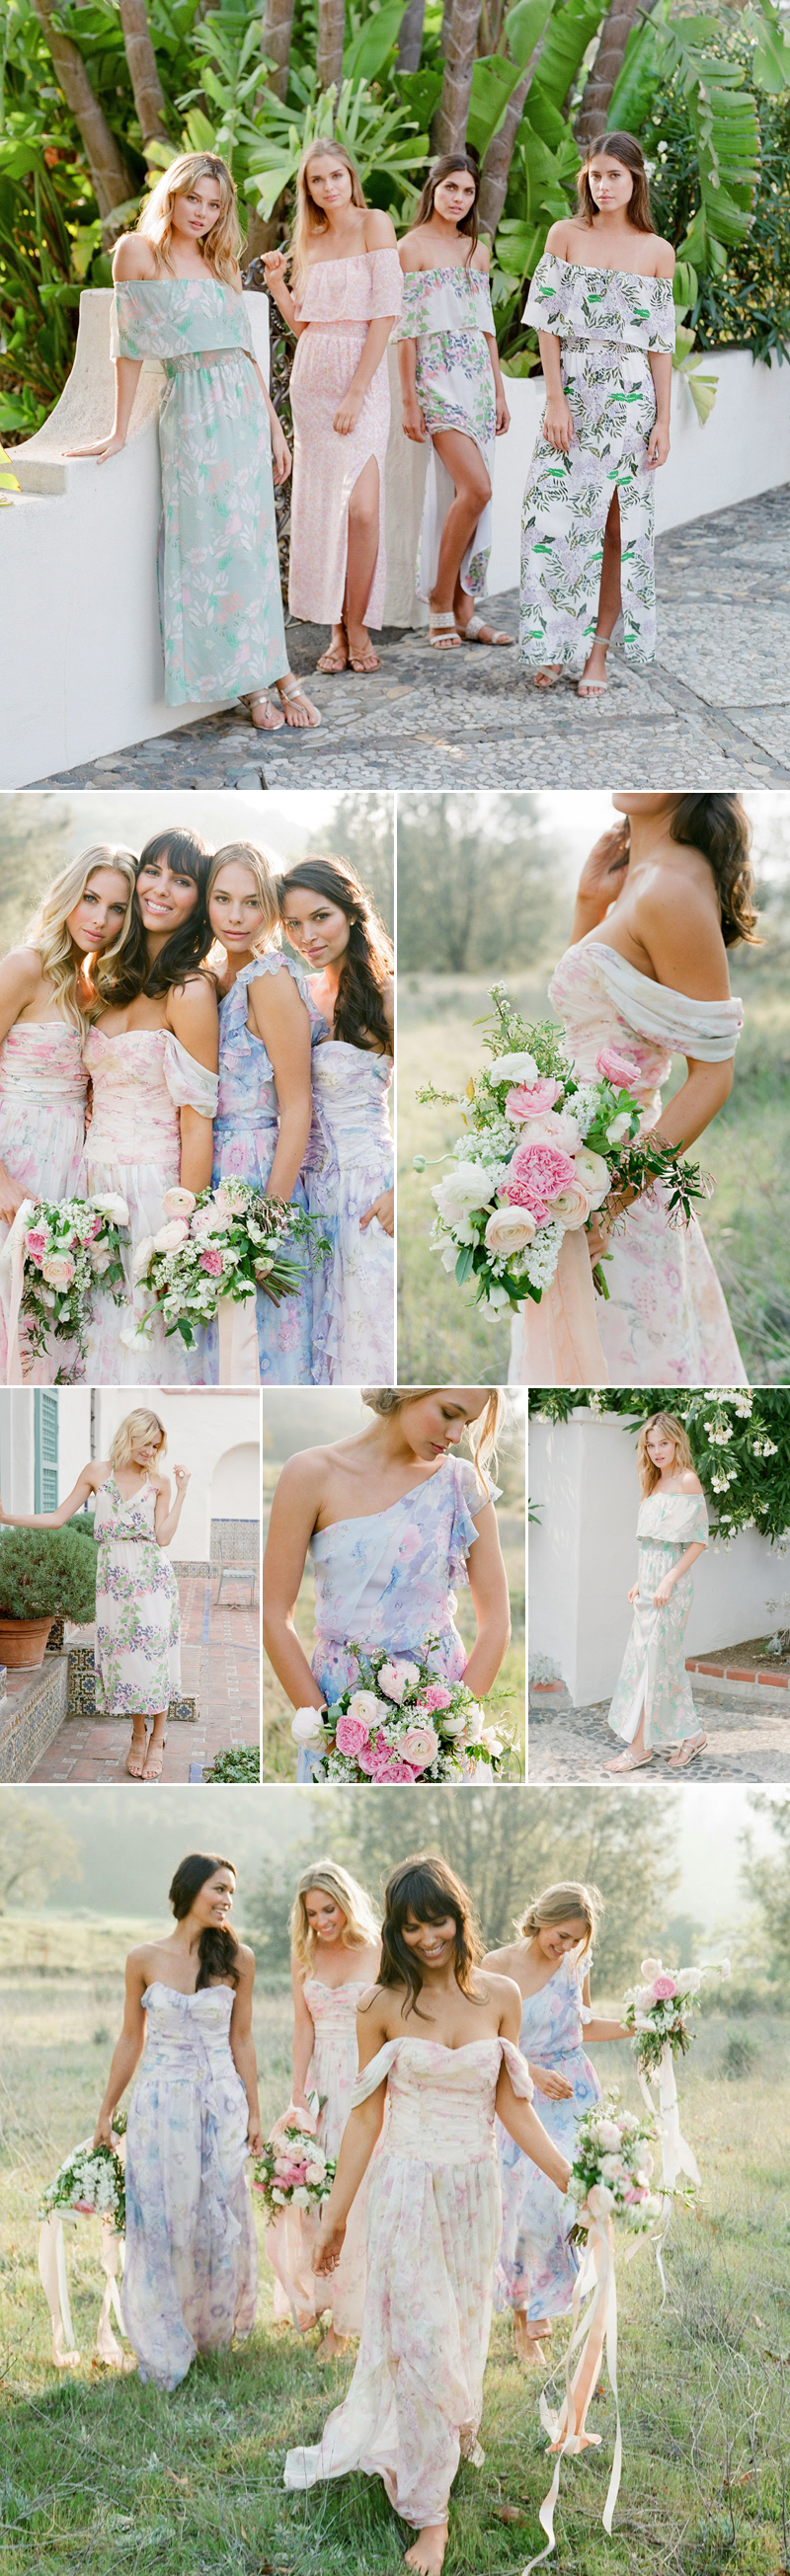 flower-bridesmaids01-plumprettysugar